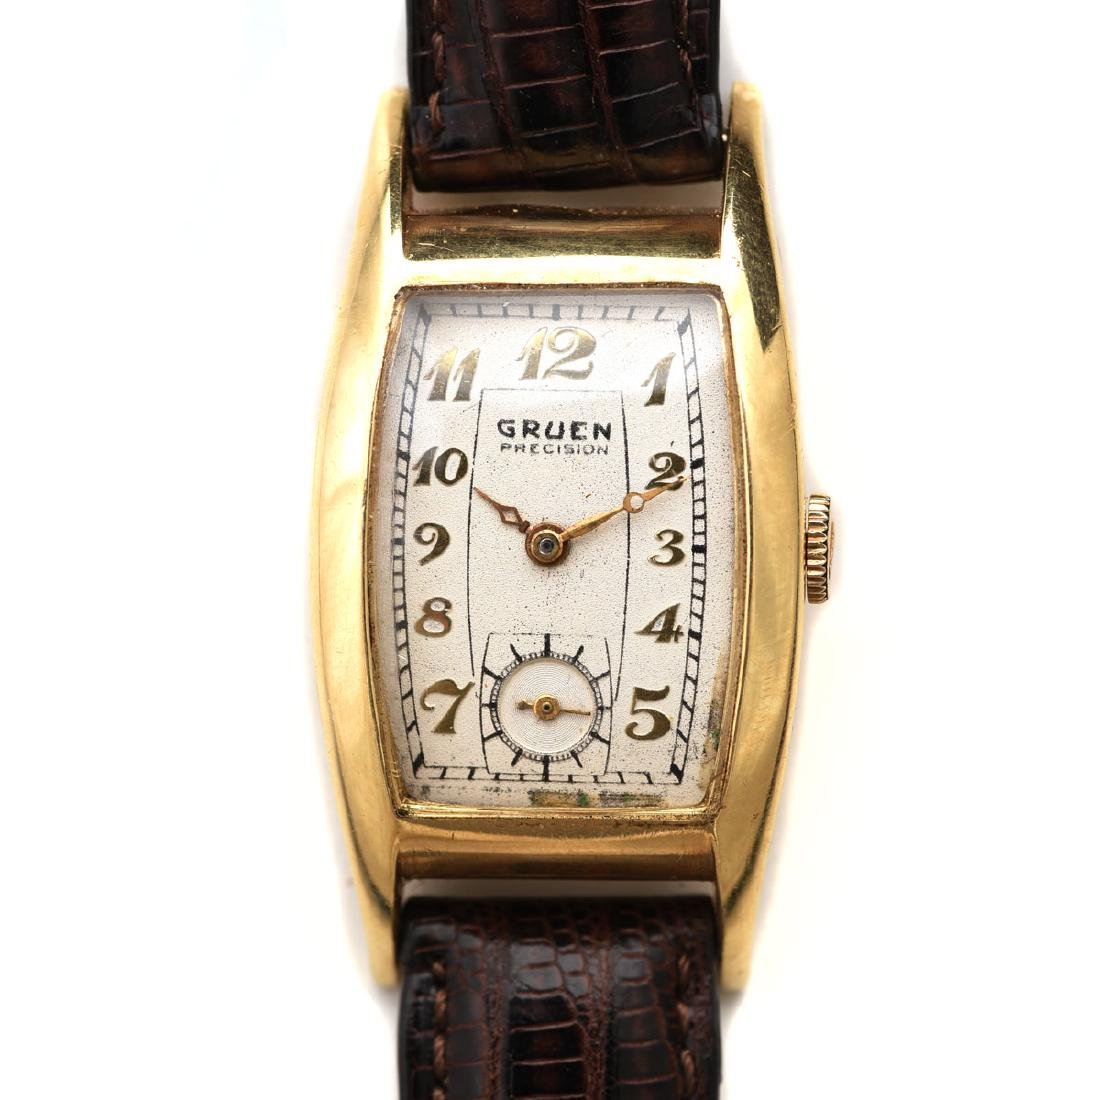 Gruen Curvex 14k, Leather Wristwatch.